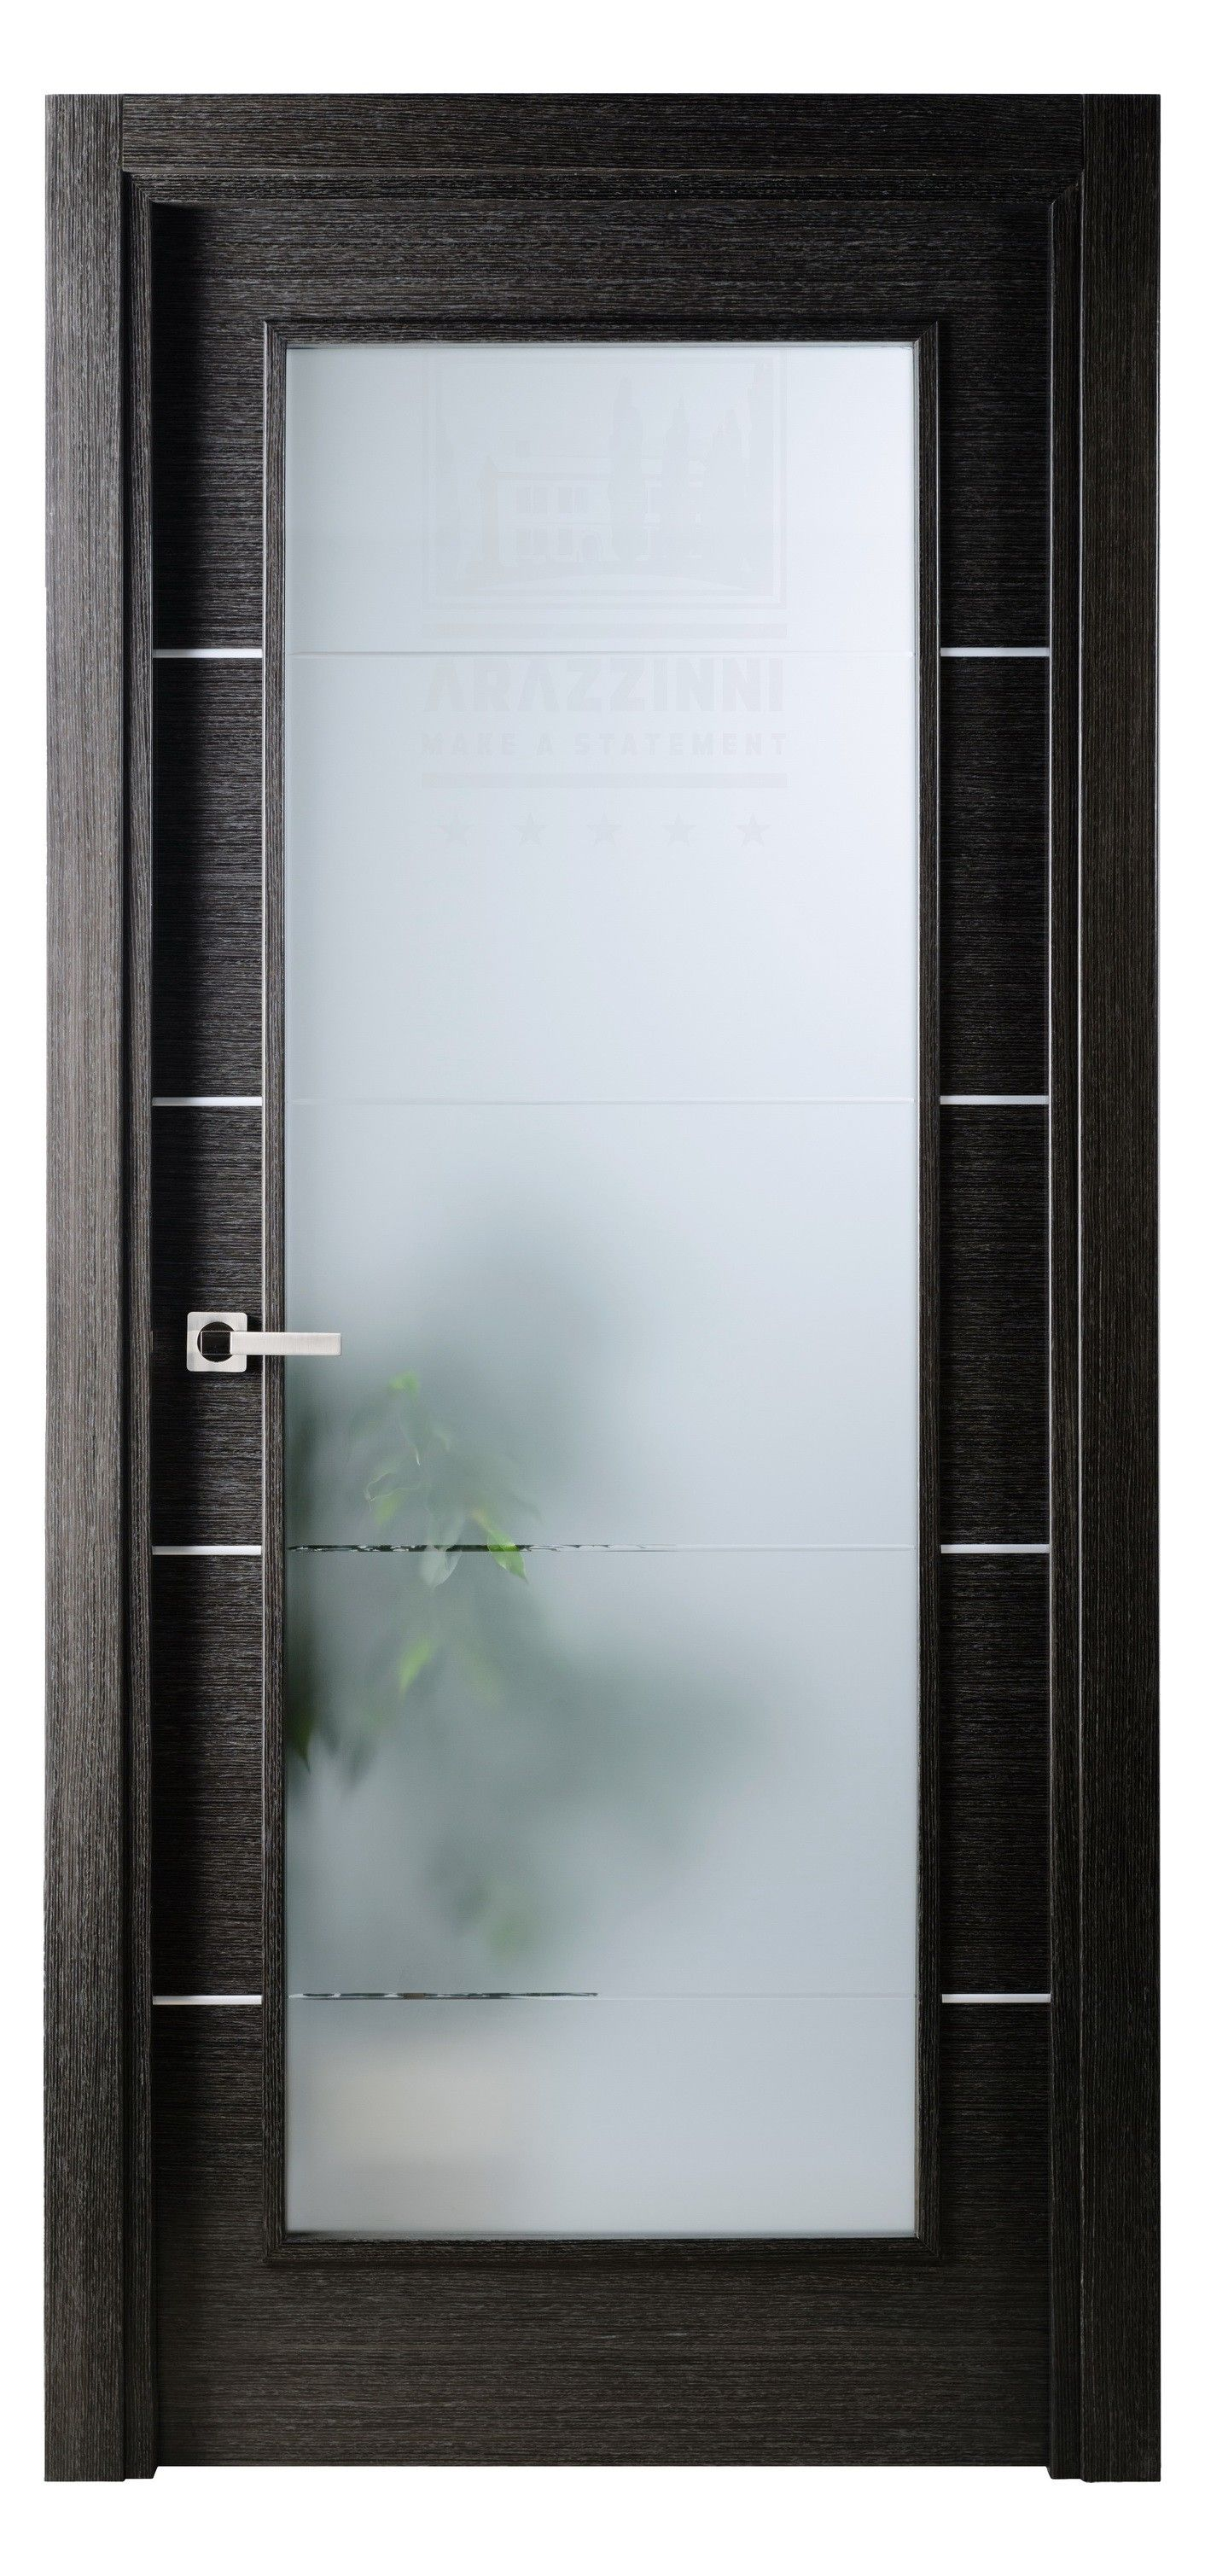 Single Interior Glass Doors arazzinni avanti vetro interior door black apricot | interior door